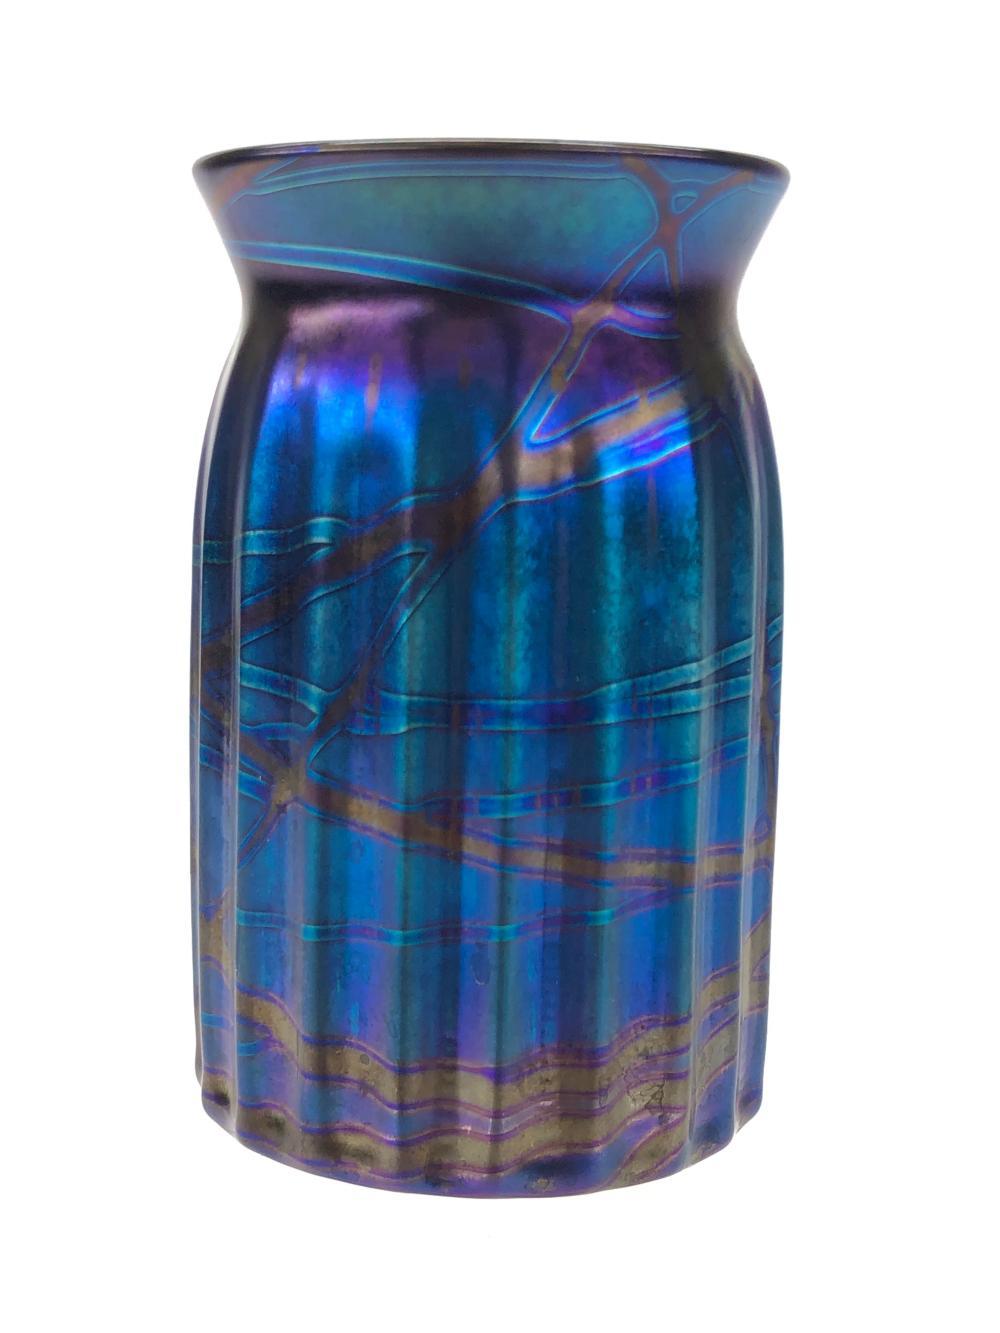 VINTAGE ELAINE HYDE BLUE IRIDESCENT RIBBED GLASS VASE